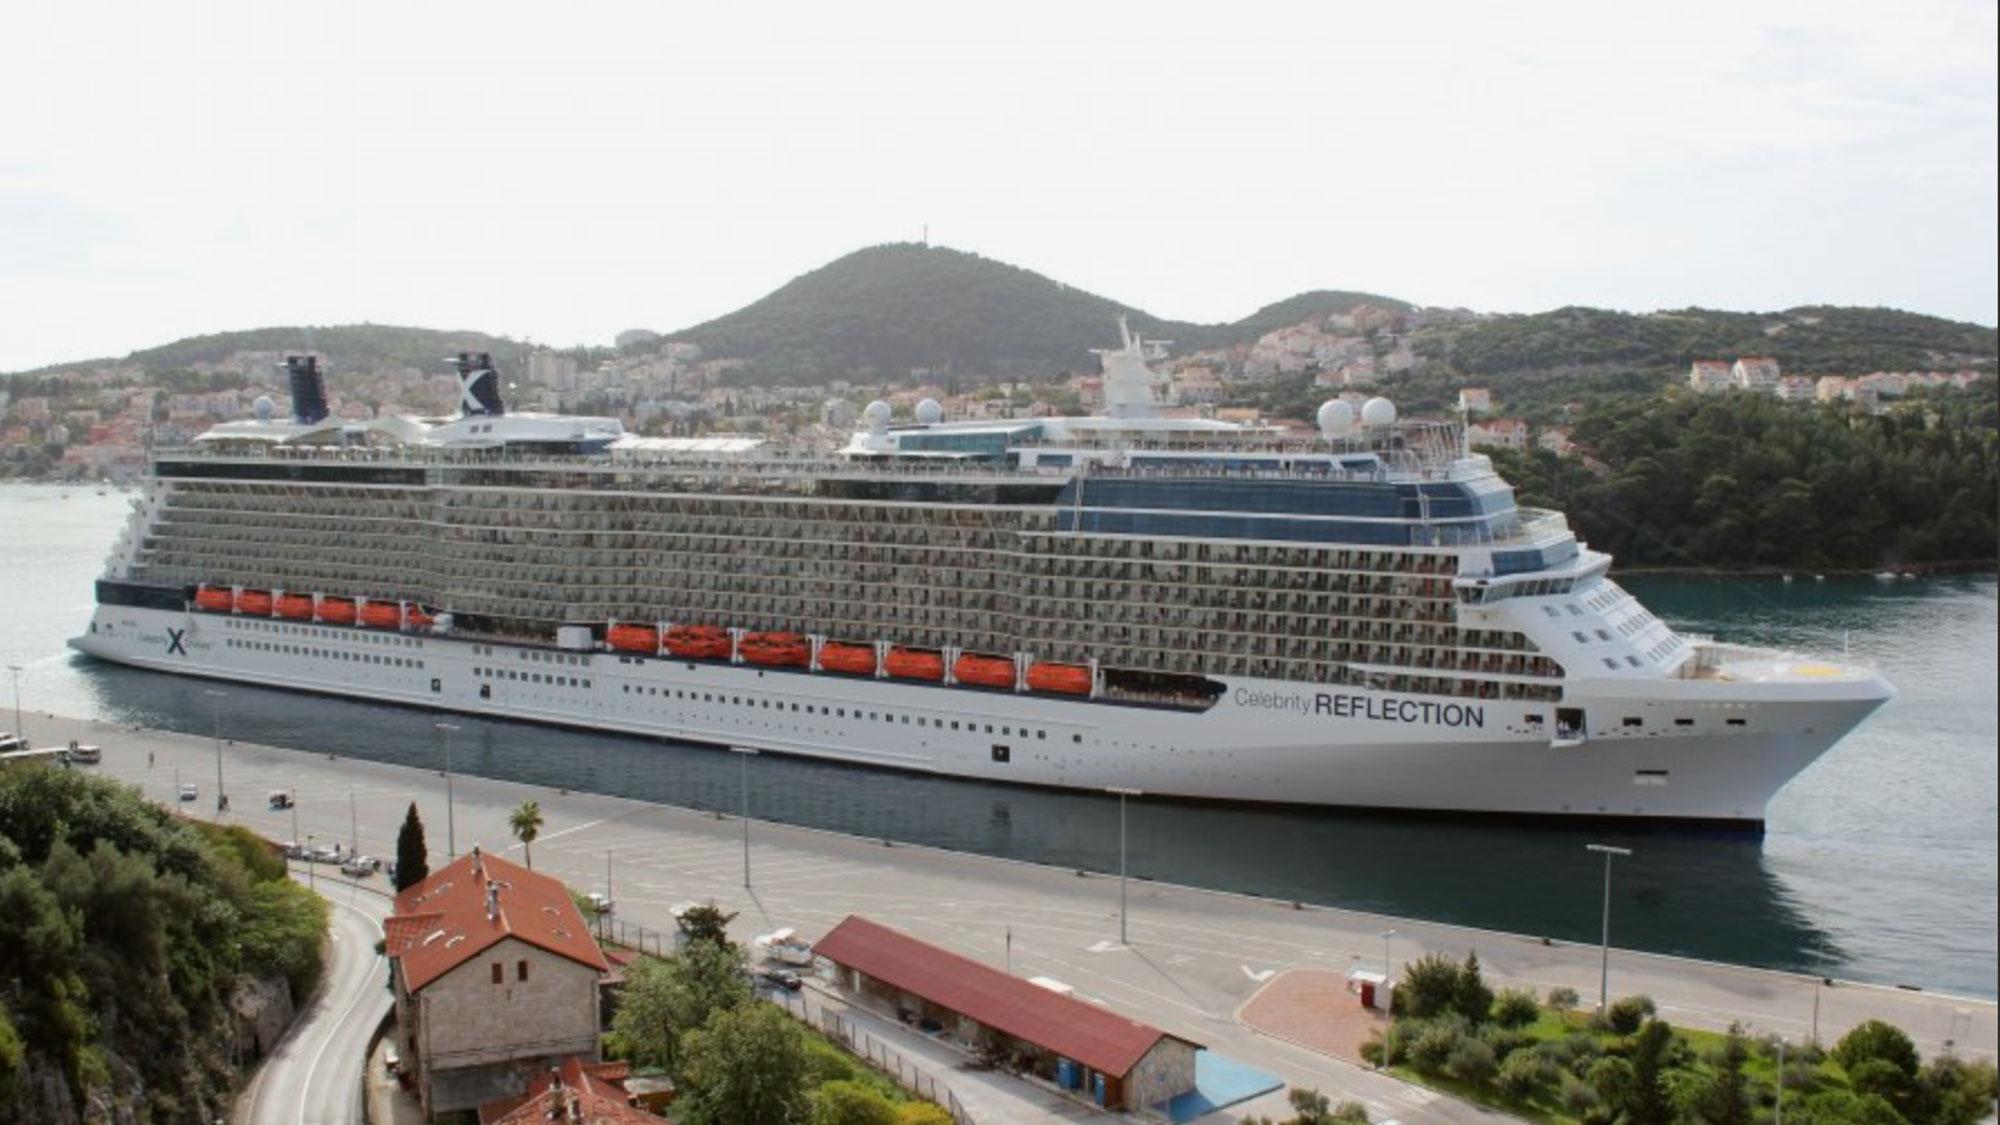 The Celebtity Reflection in Dubrovnik.